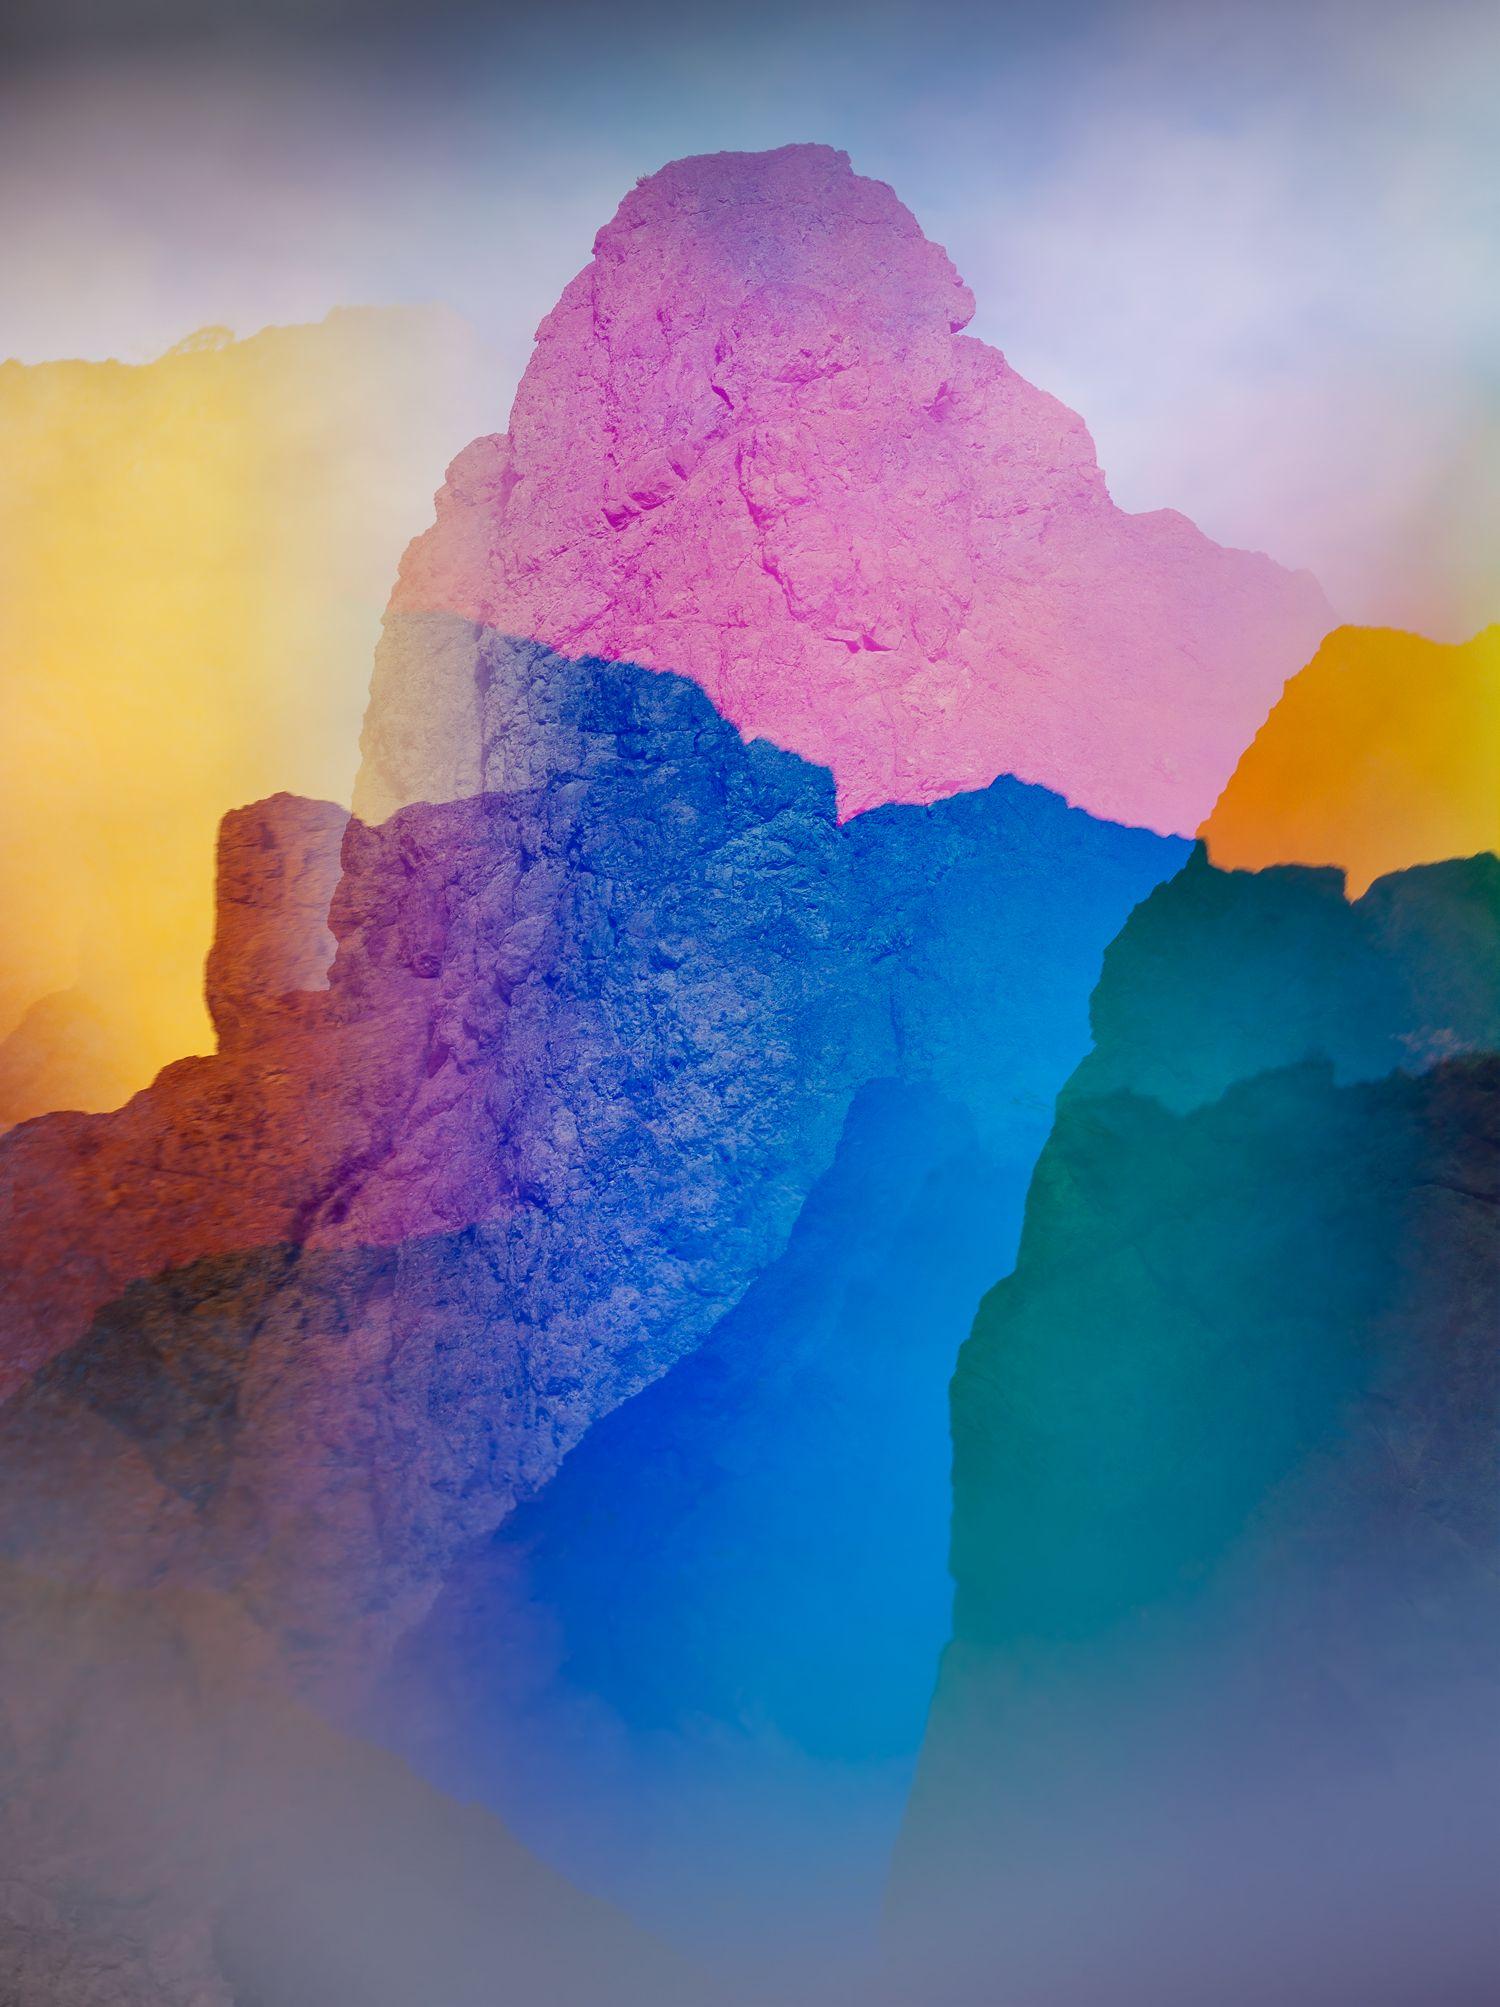 These Psychedelic Rainbow Colored Landscape Photos Make A Subtle Political Statement Landscape Photography Colorful Landscape Landscaping With Rocks